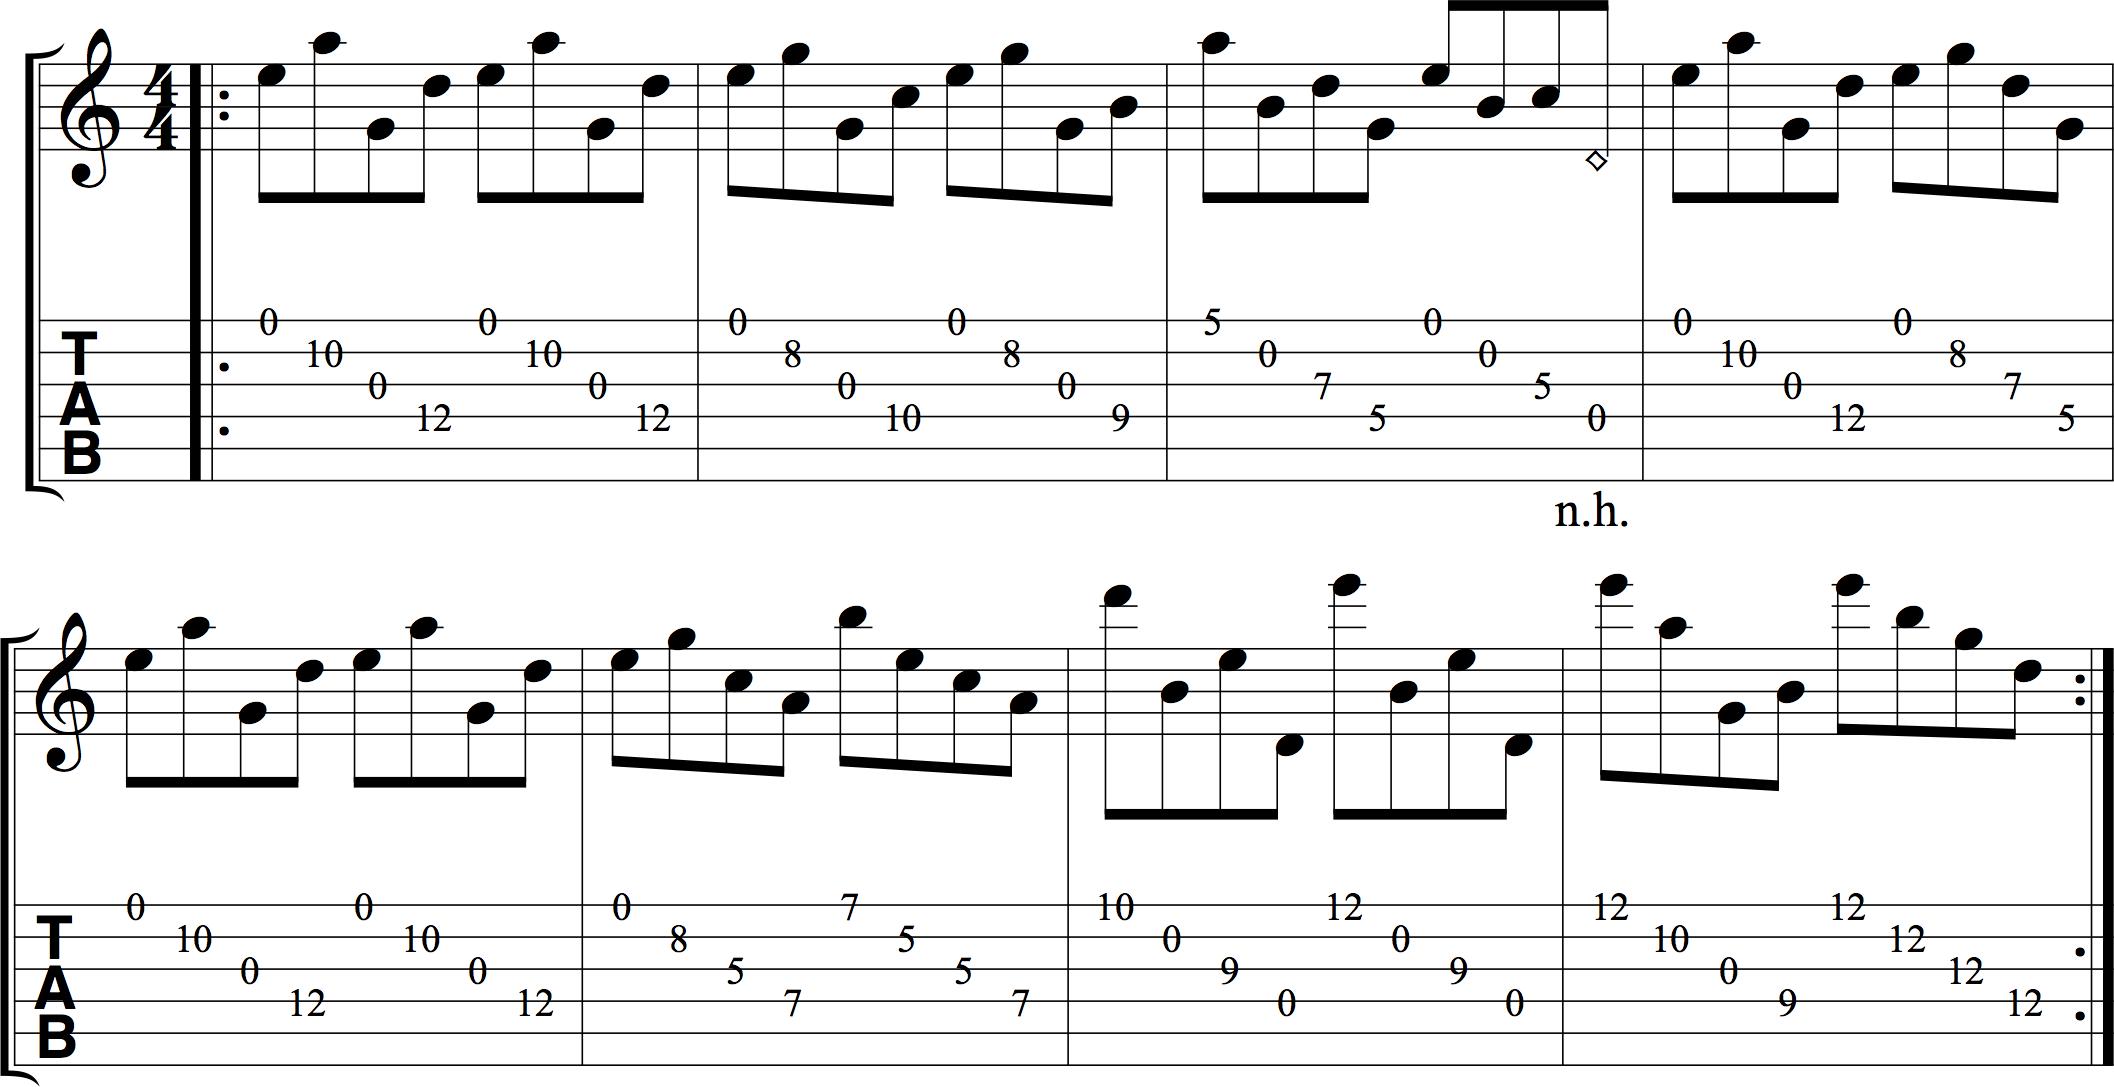 guitar alternate picking exercise.